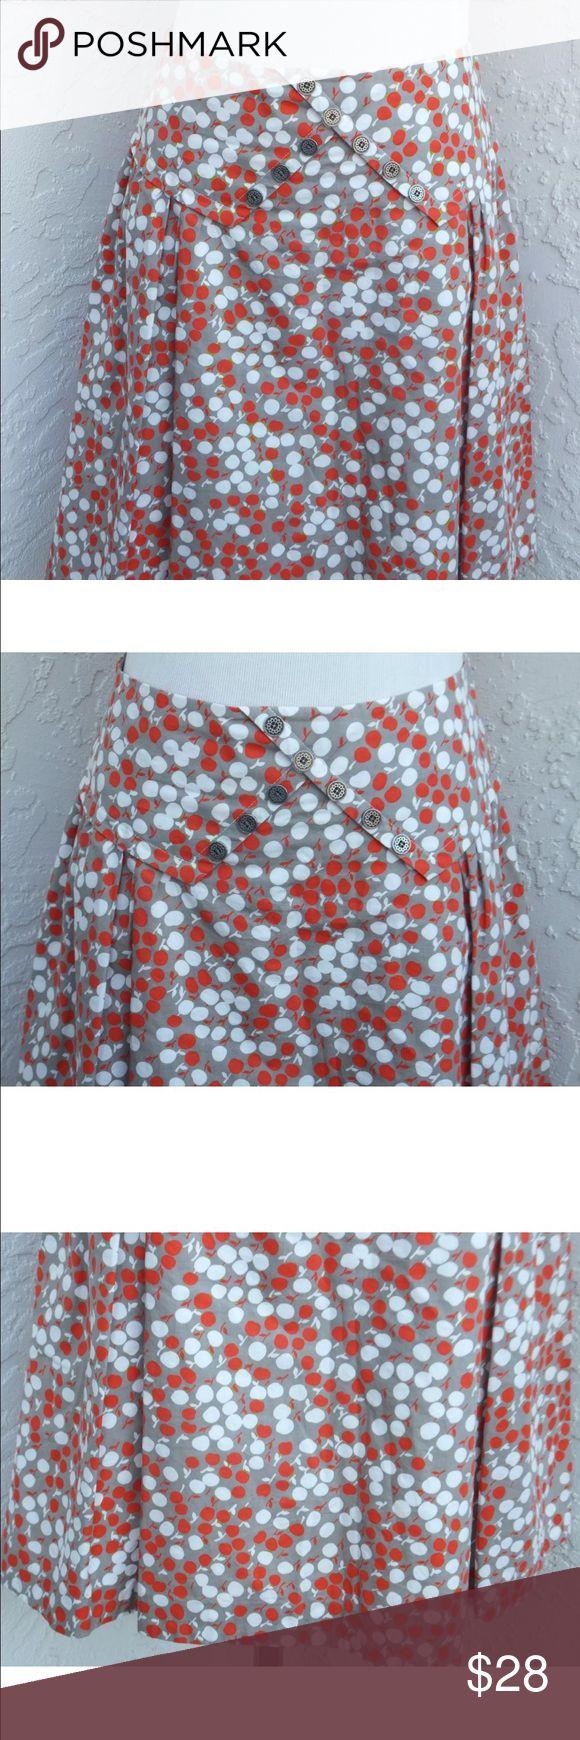 Selling this Girls From Savoy size 2 skirt on Poshmark! My username is: 257shay. #shopmycloset #poshmark #fashion #shopping #style #forsale #Anthropologie #Dresses & Skirts